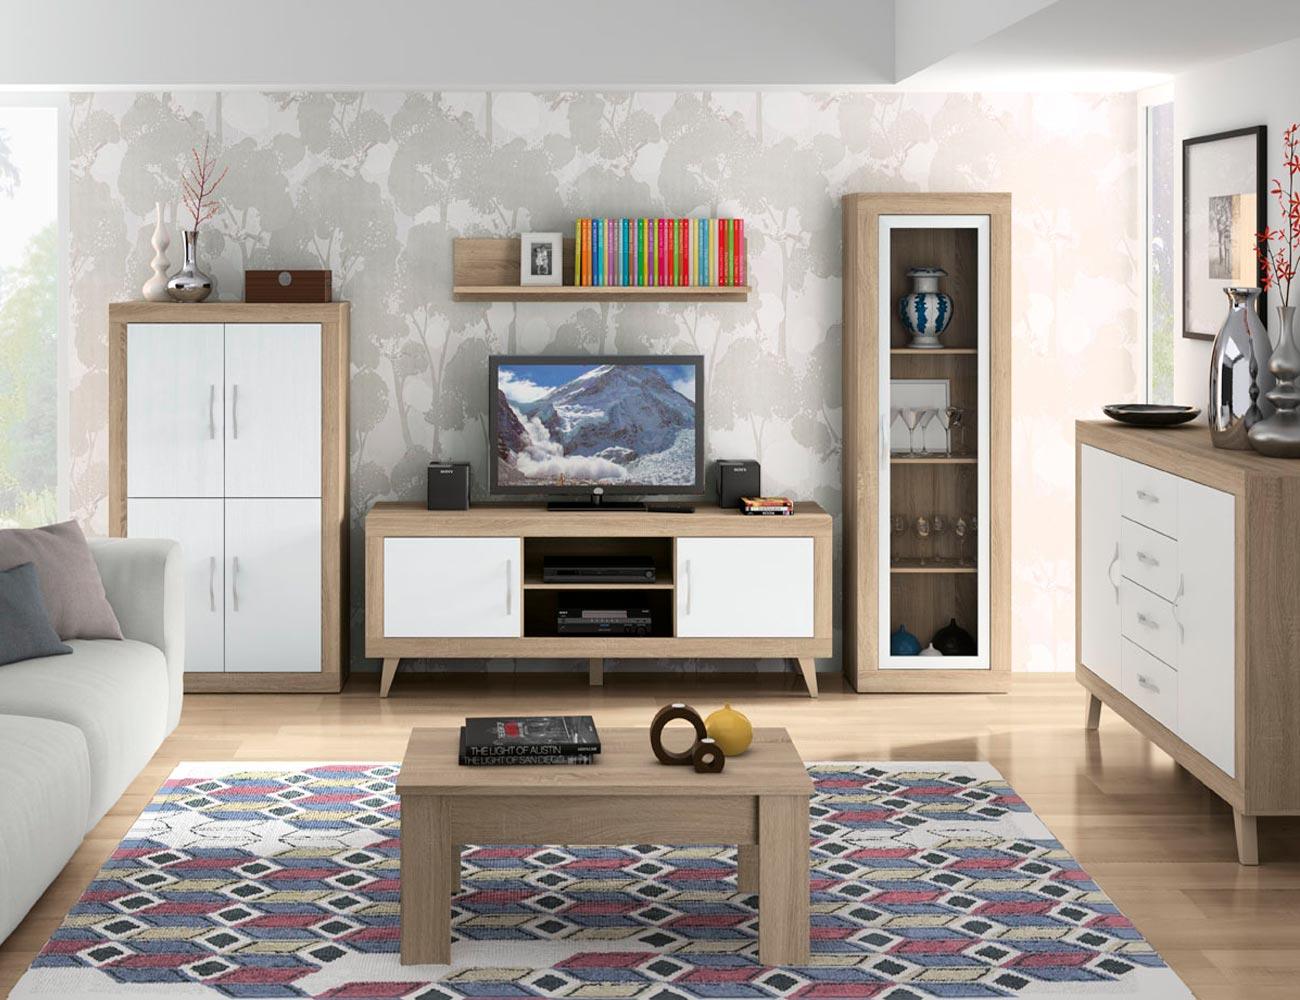 152 mueble salon comedor modulo bodeguero cambrian soul blanco1